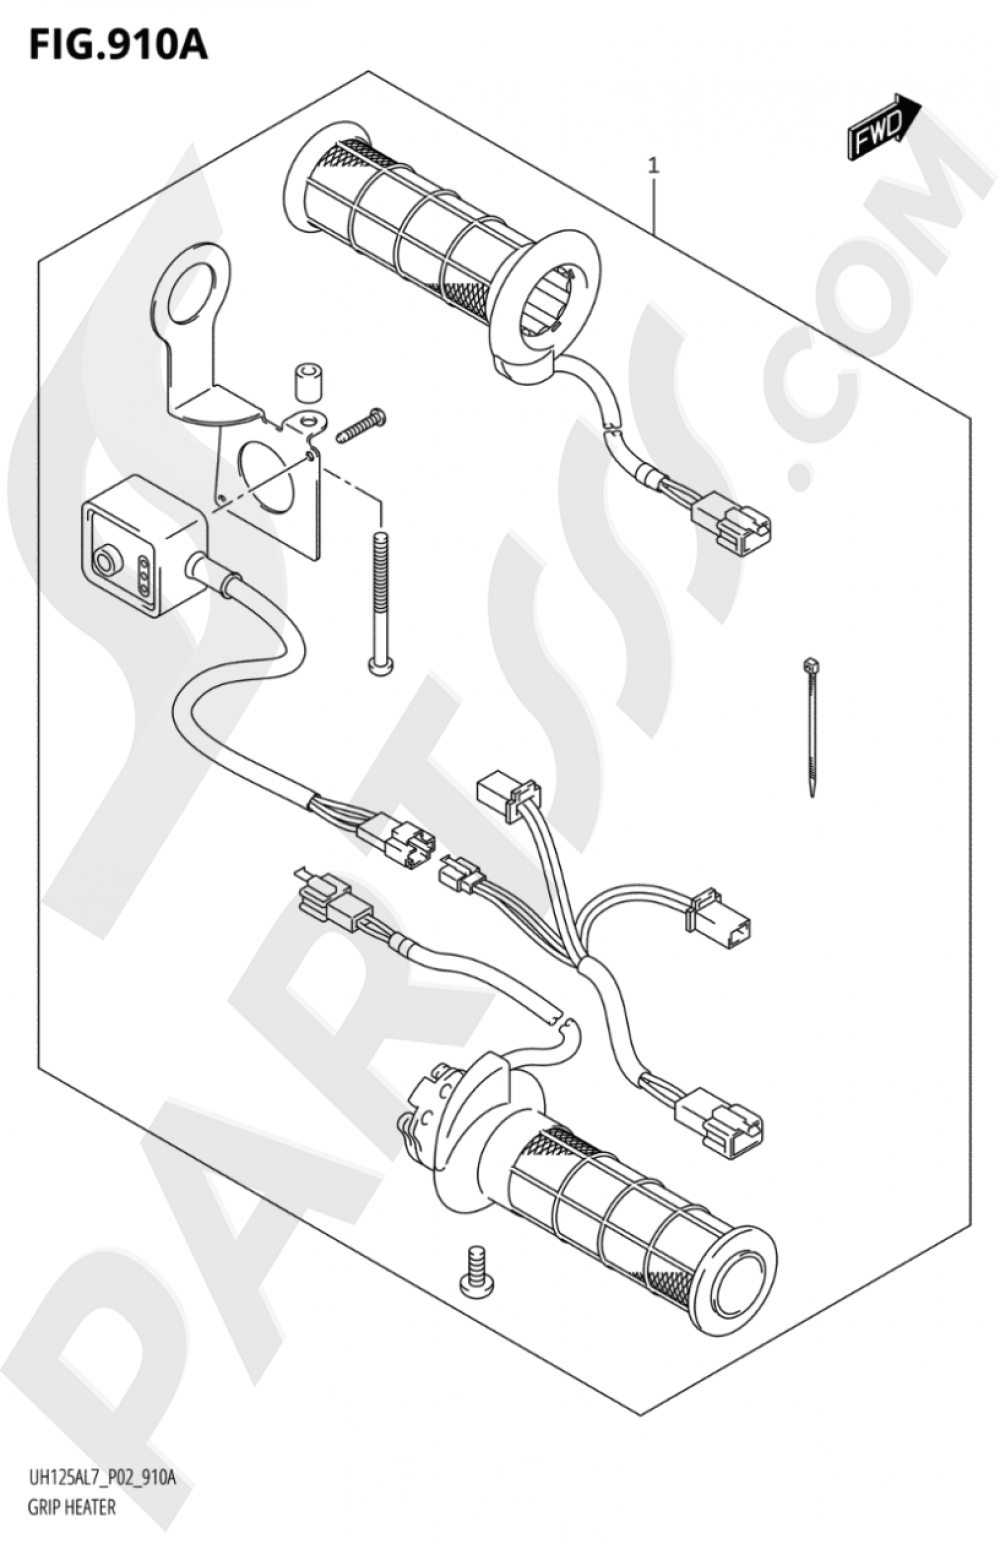 910A - GRIP HEATER (OPTIONAL) Suzuki BURGMAN UH125A 2017